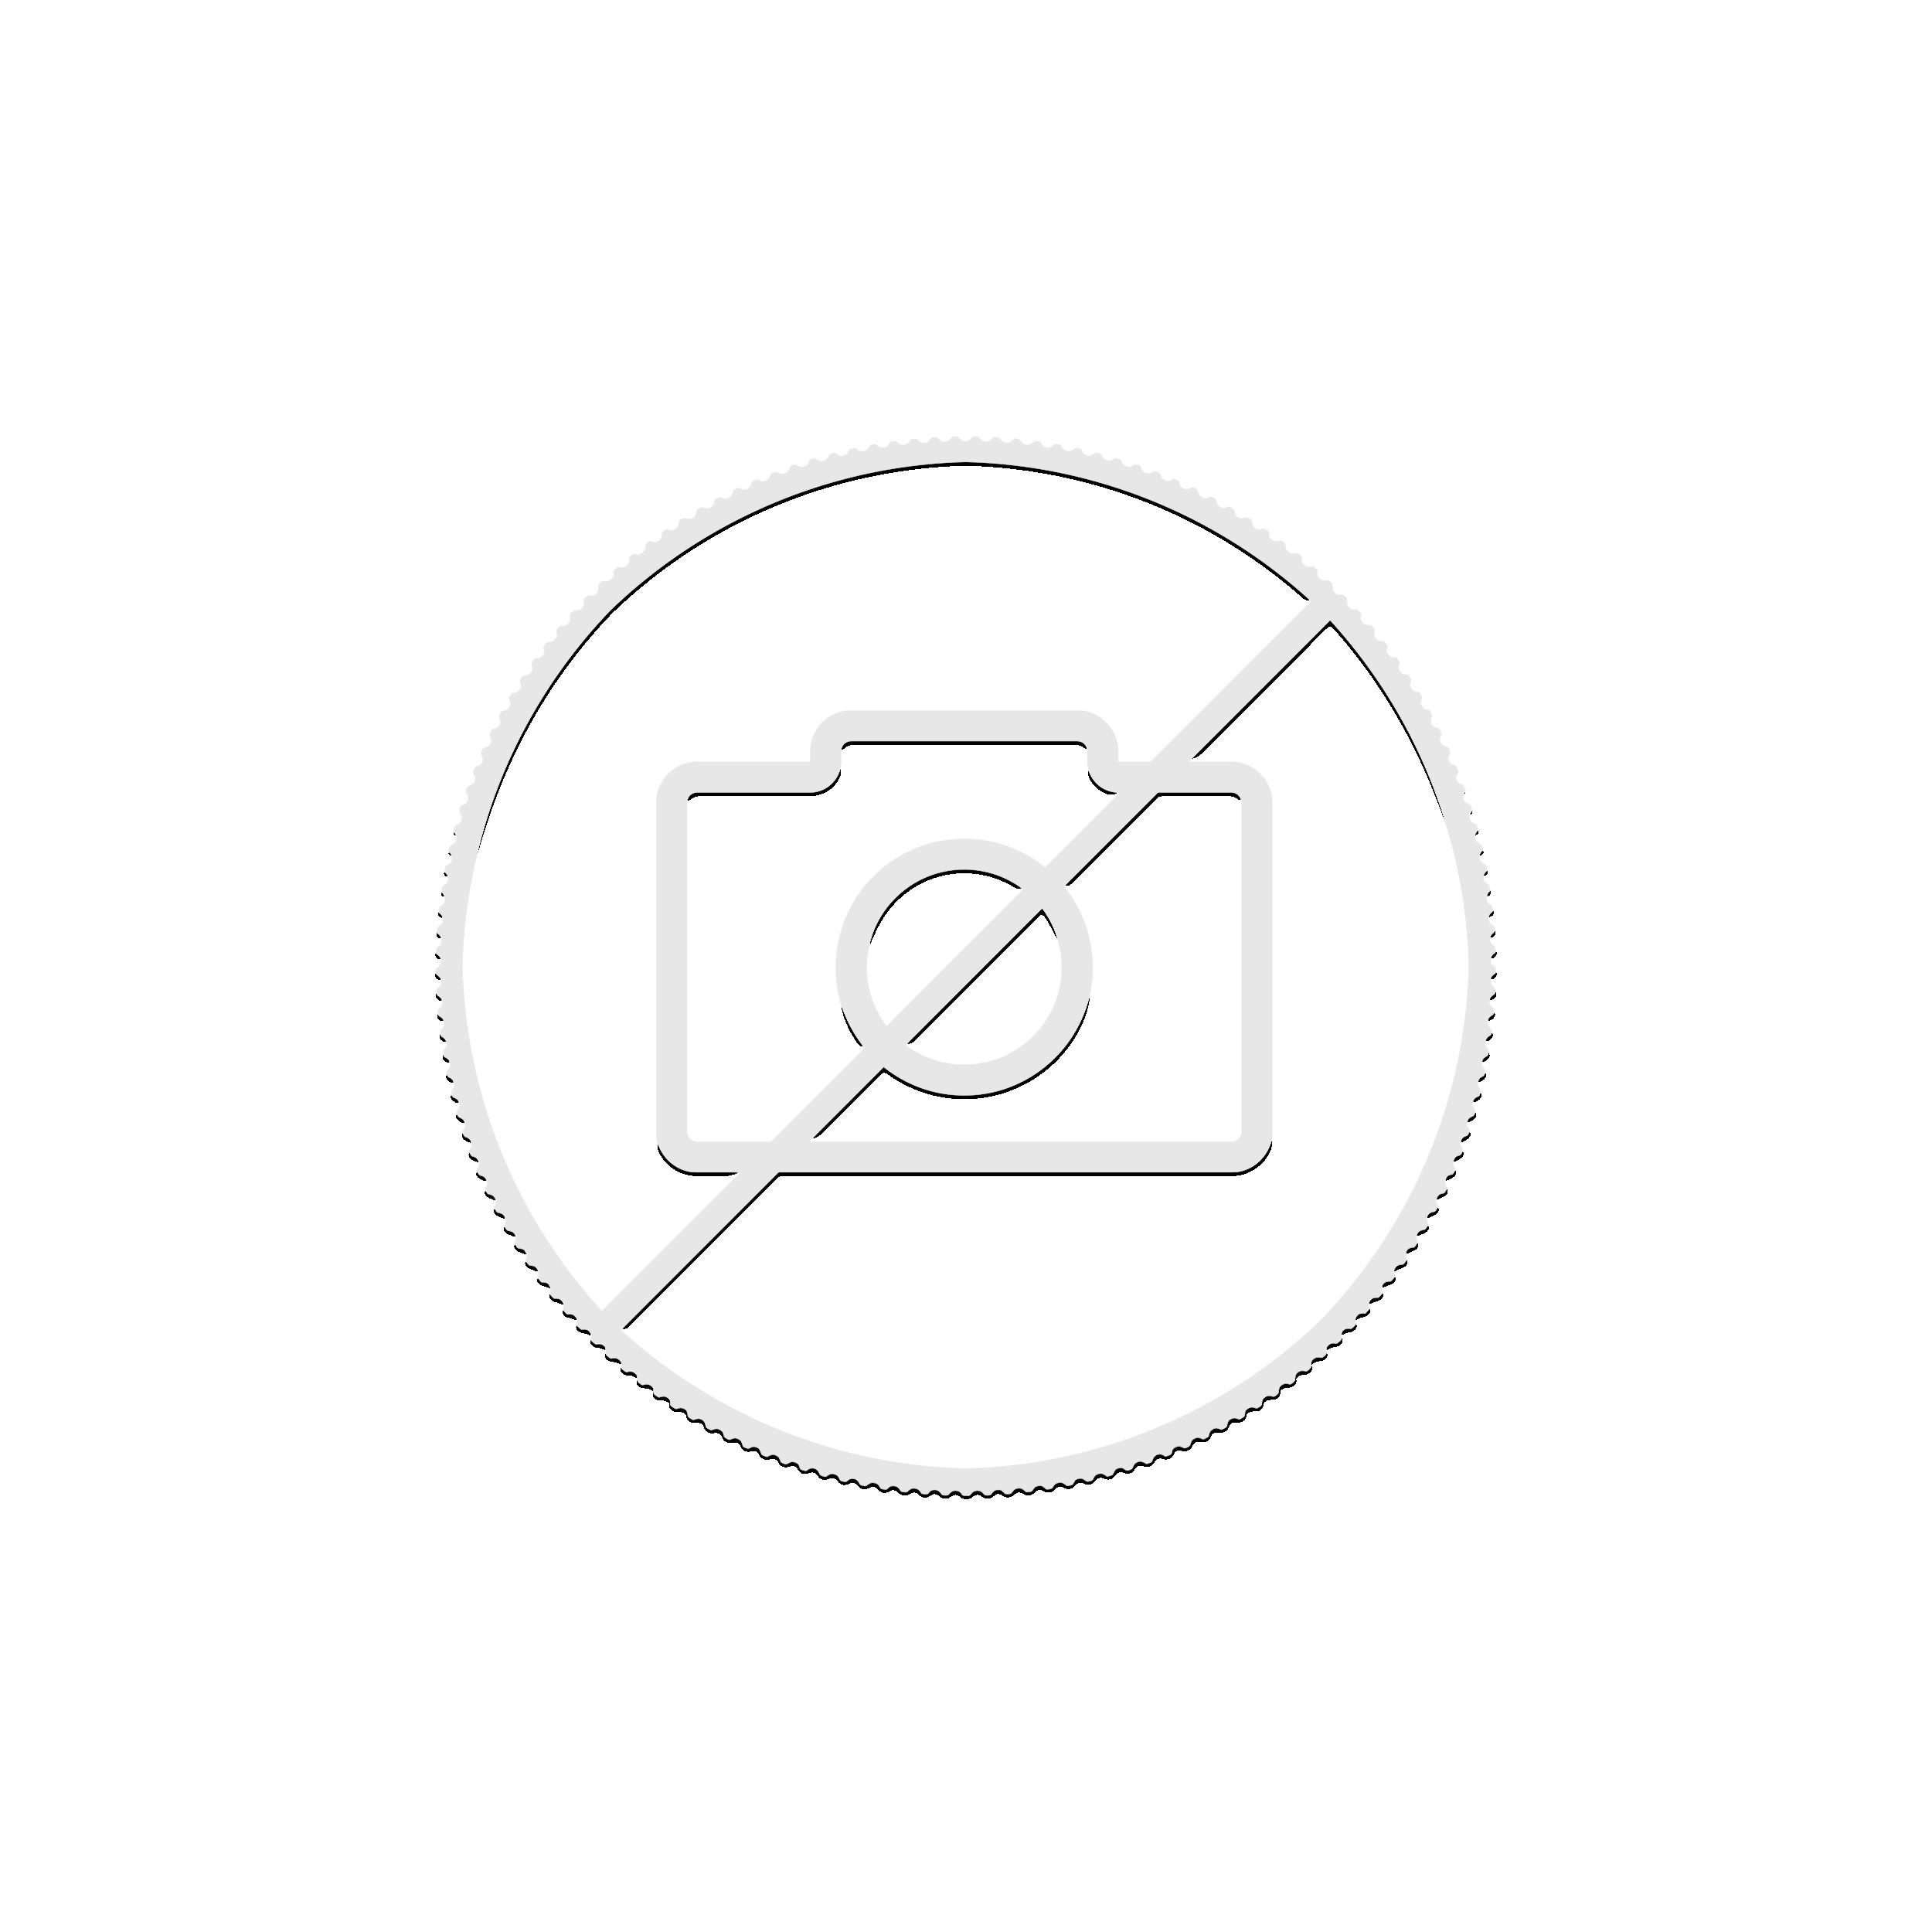 Gold bar 500 grams C. Hafner